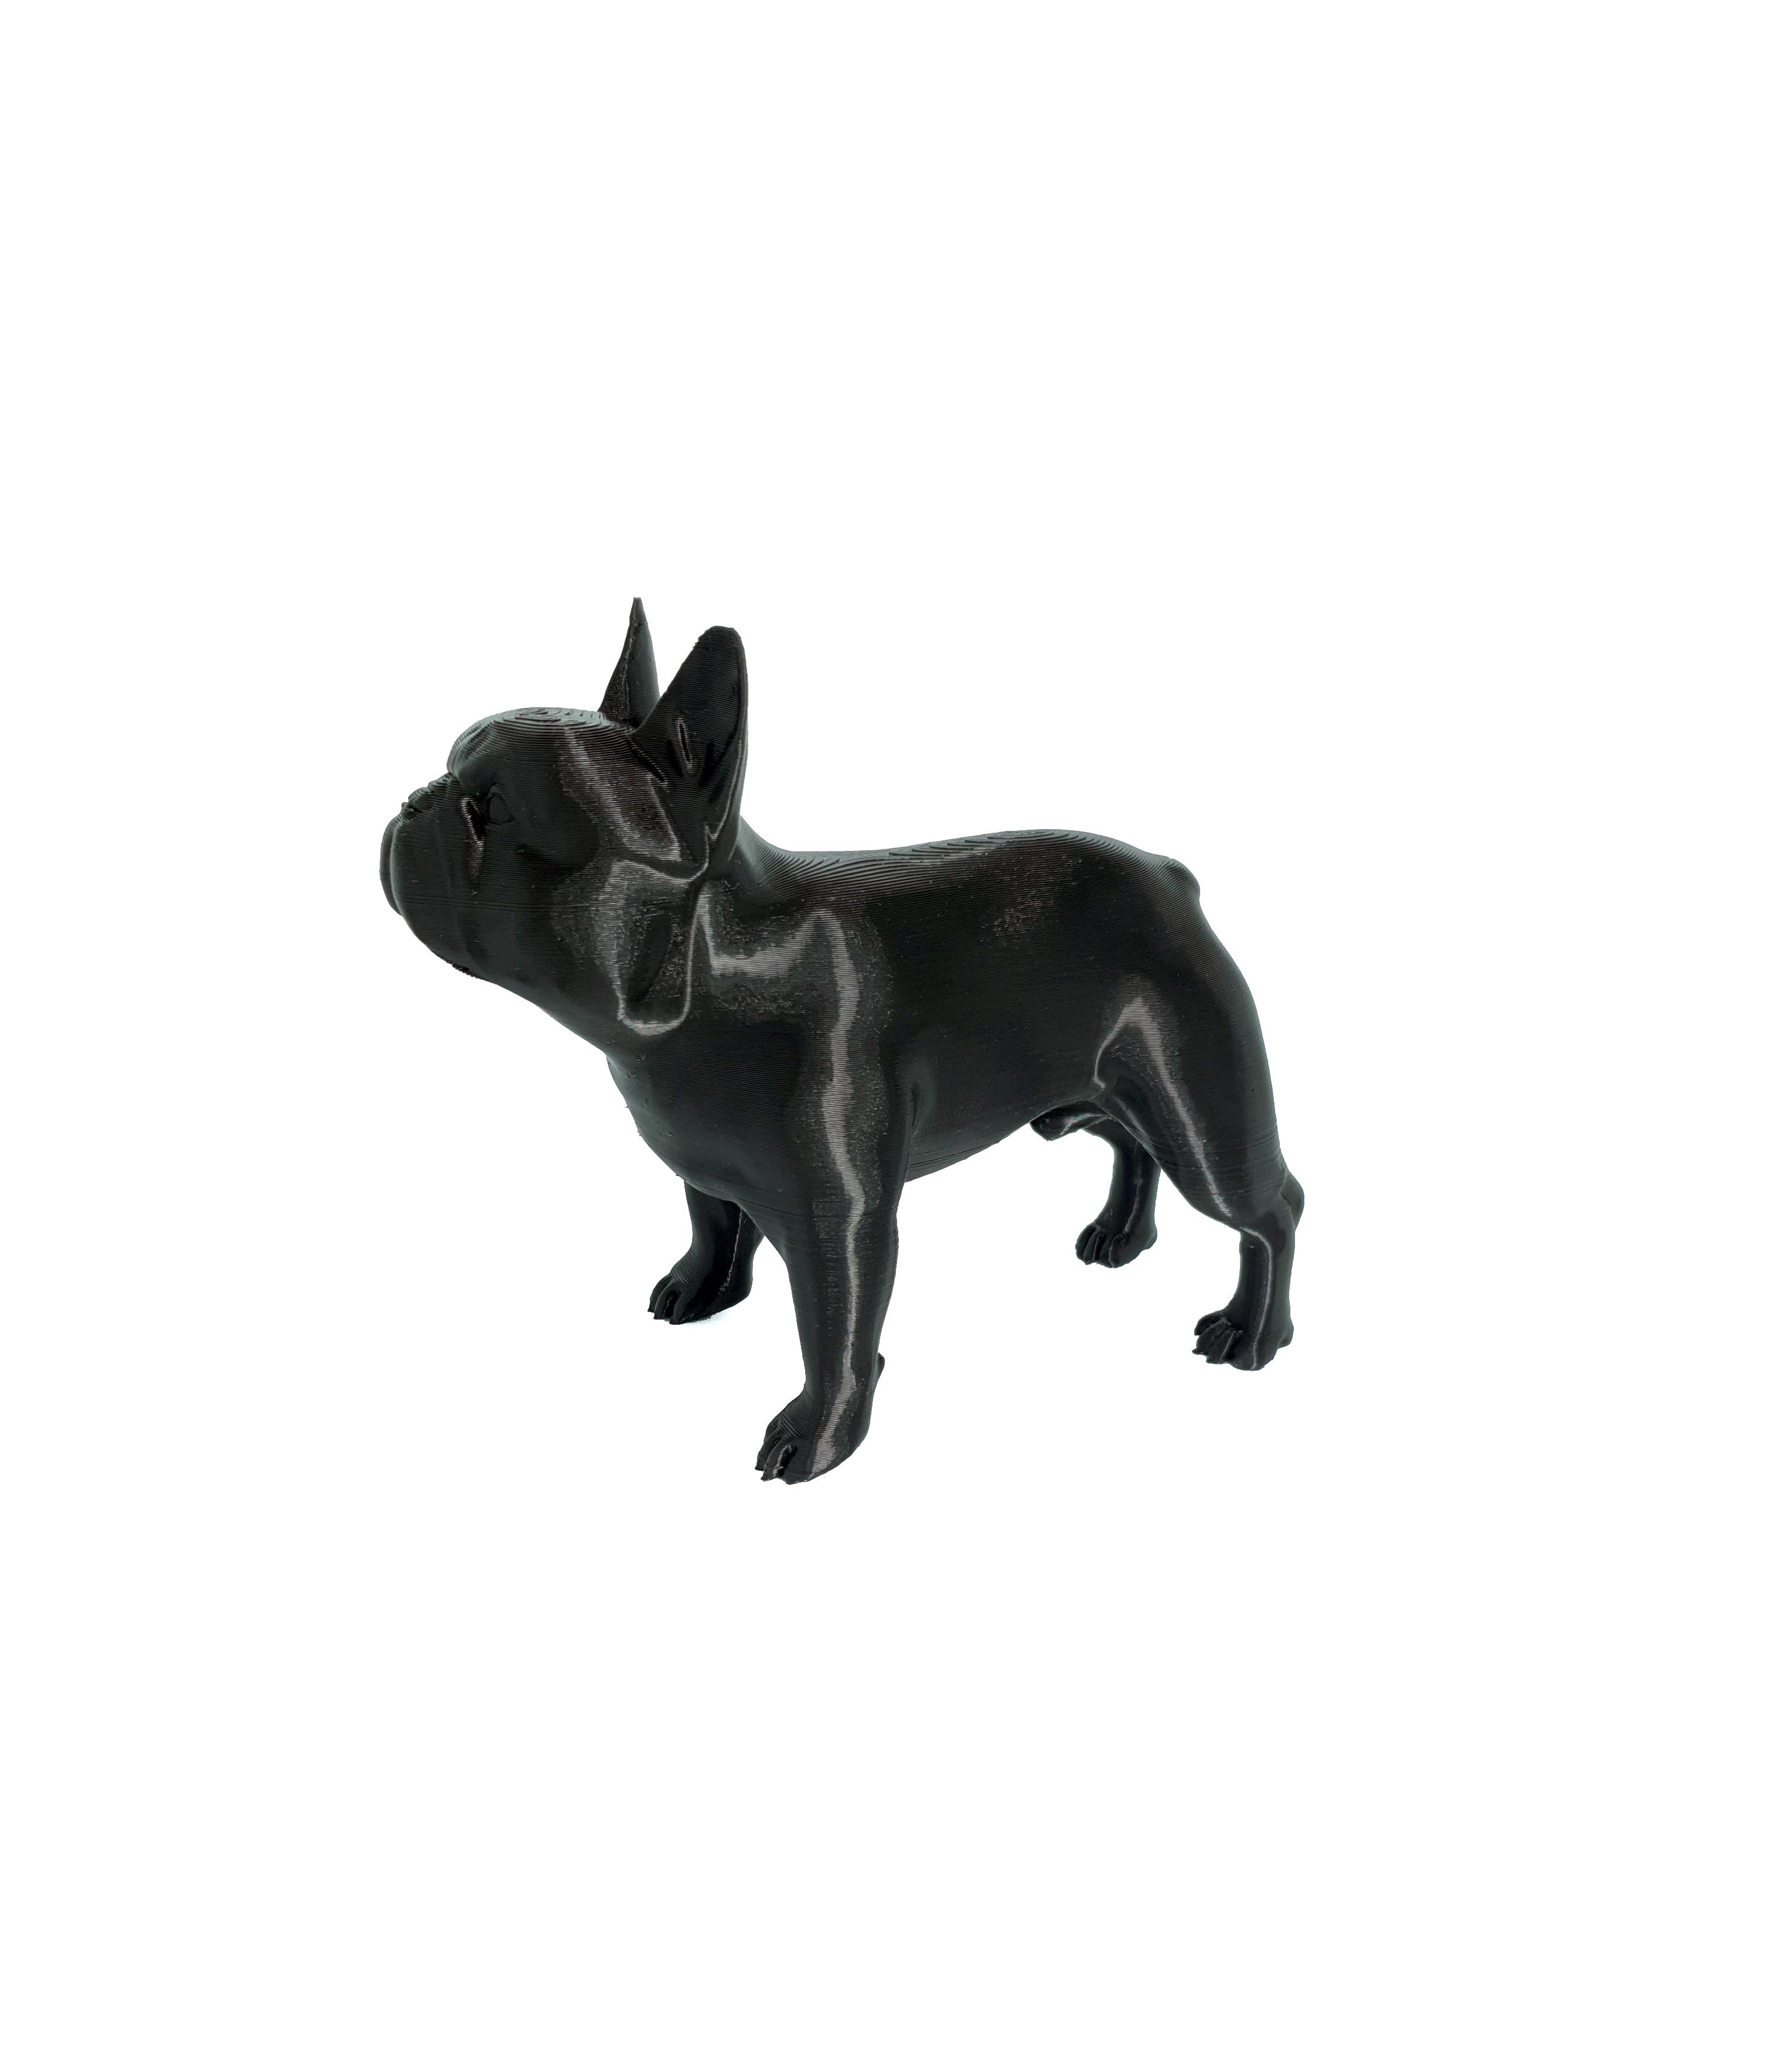 2.jpg Download free STL file Perro Bull Dog FRENCH BULLDOG DOG • 3D printable object, PRODUSTL56